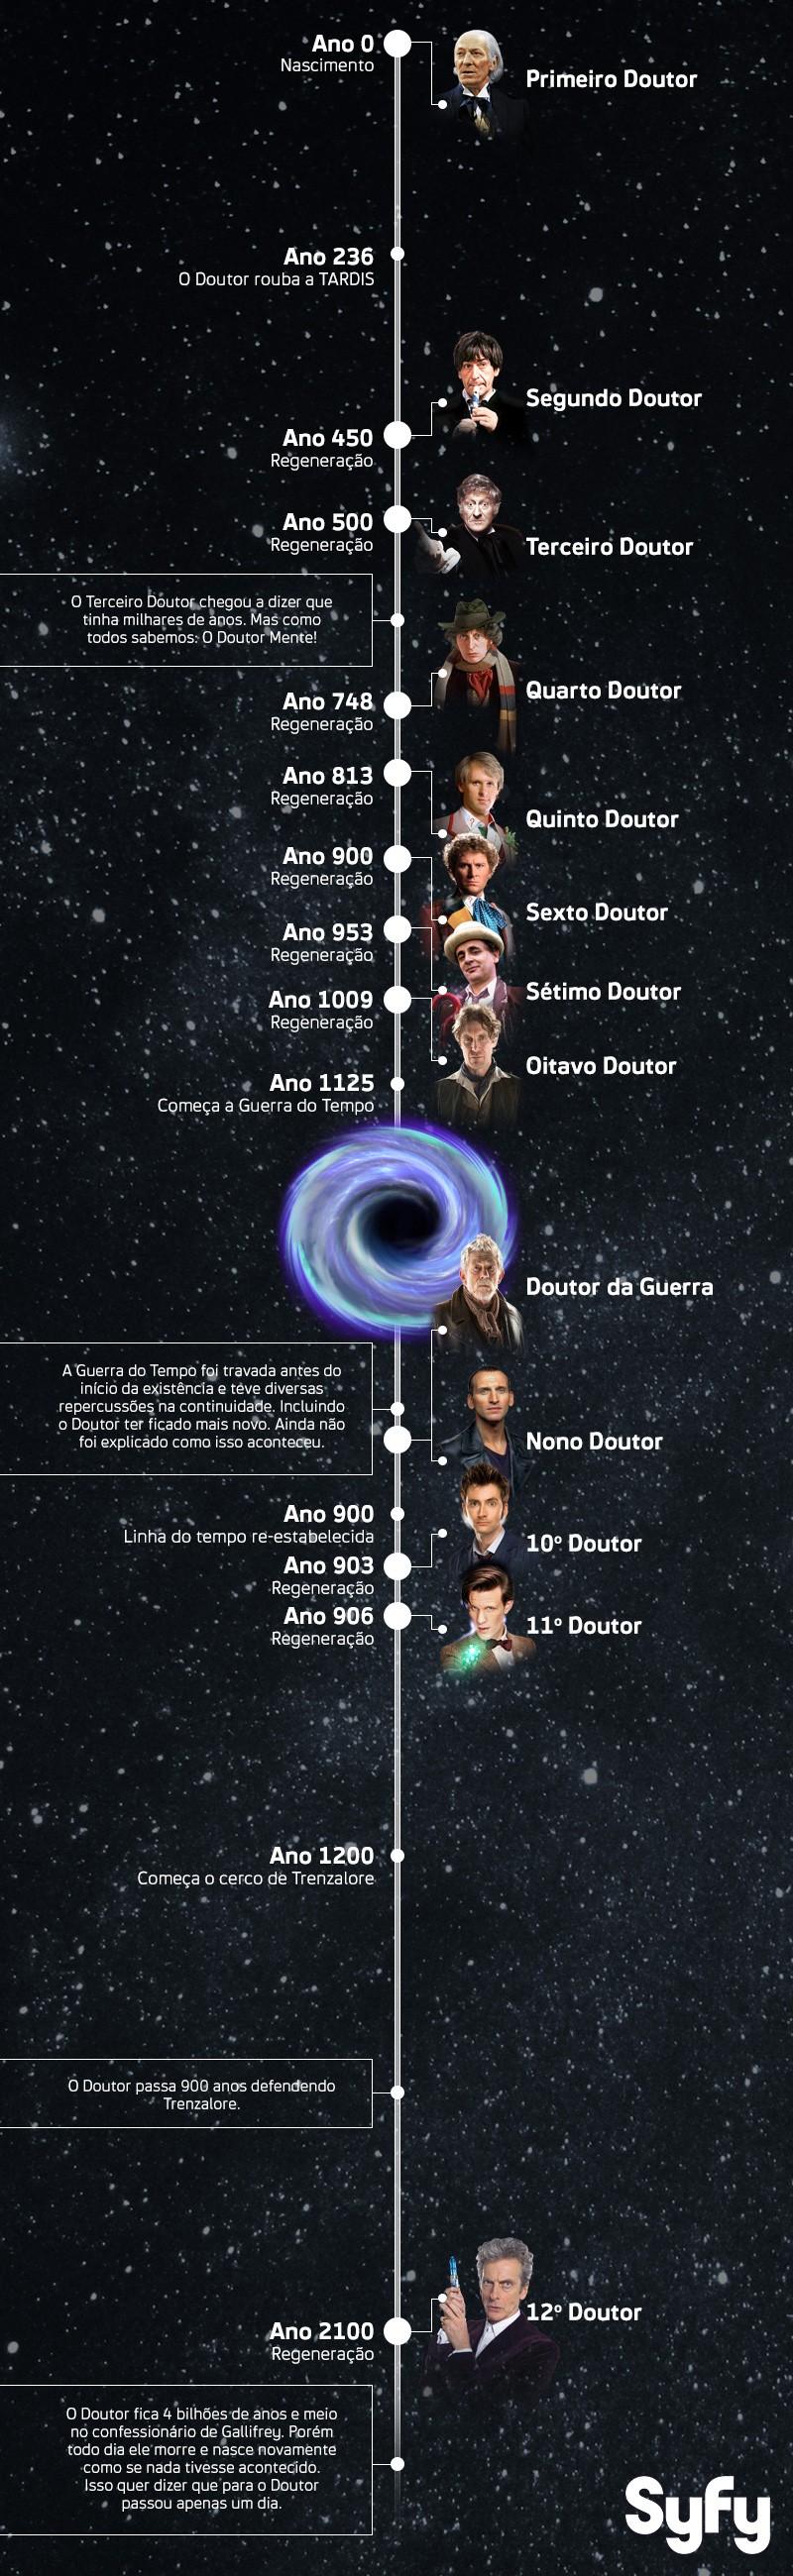 A idade do Doutor (Foto: Fusso Moro)